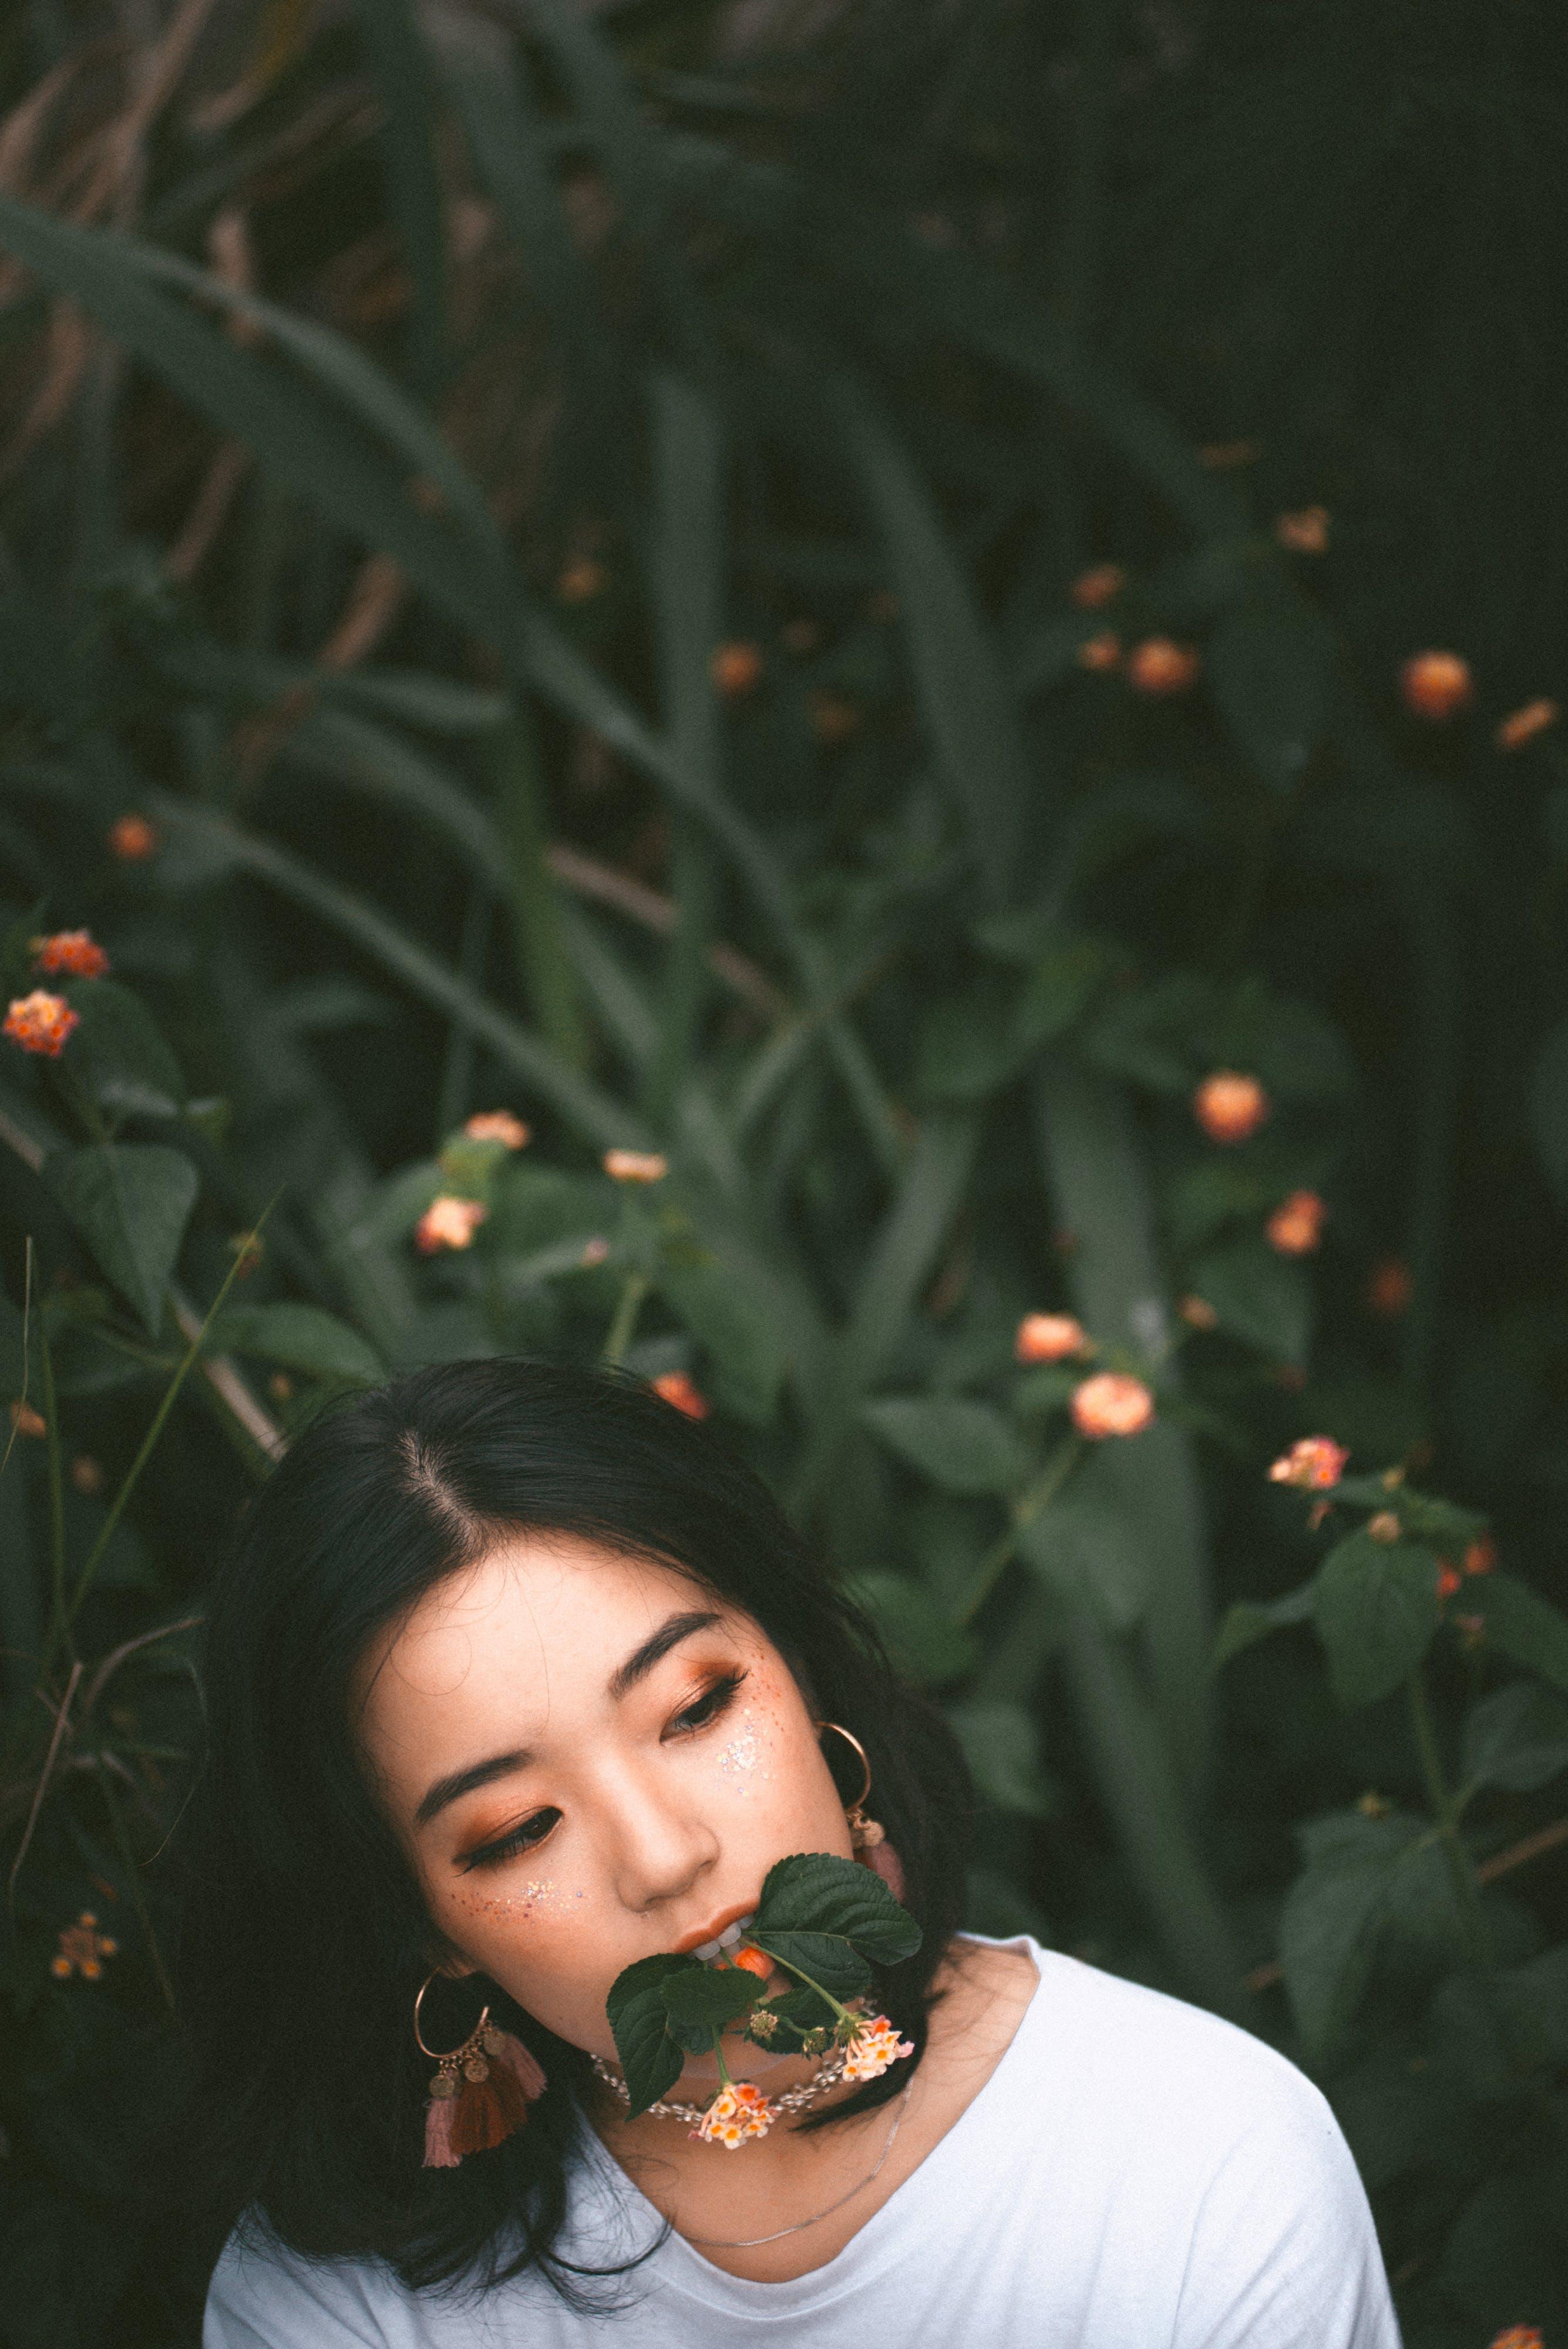 Woman Biting Green Leaf